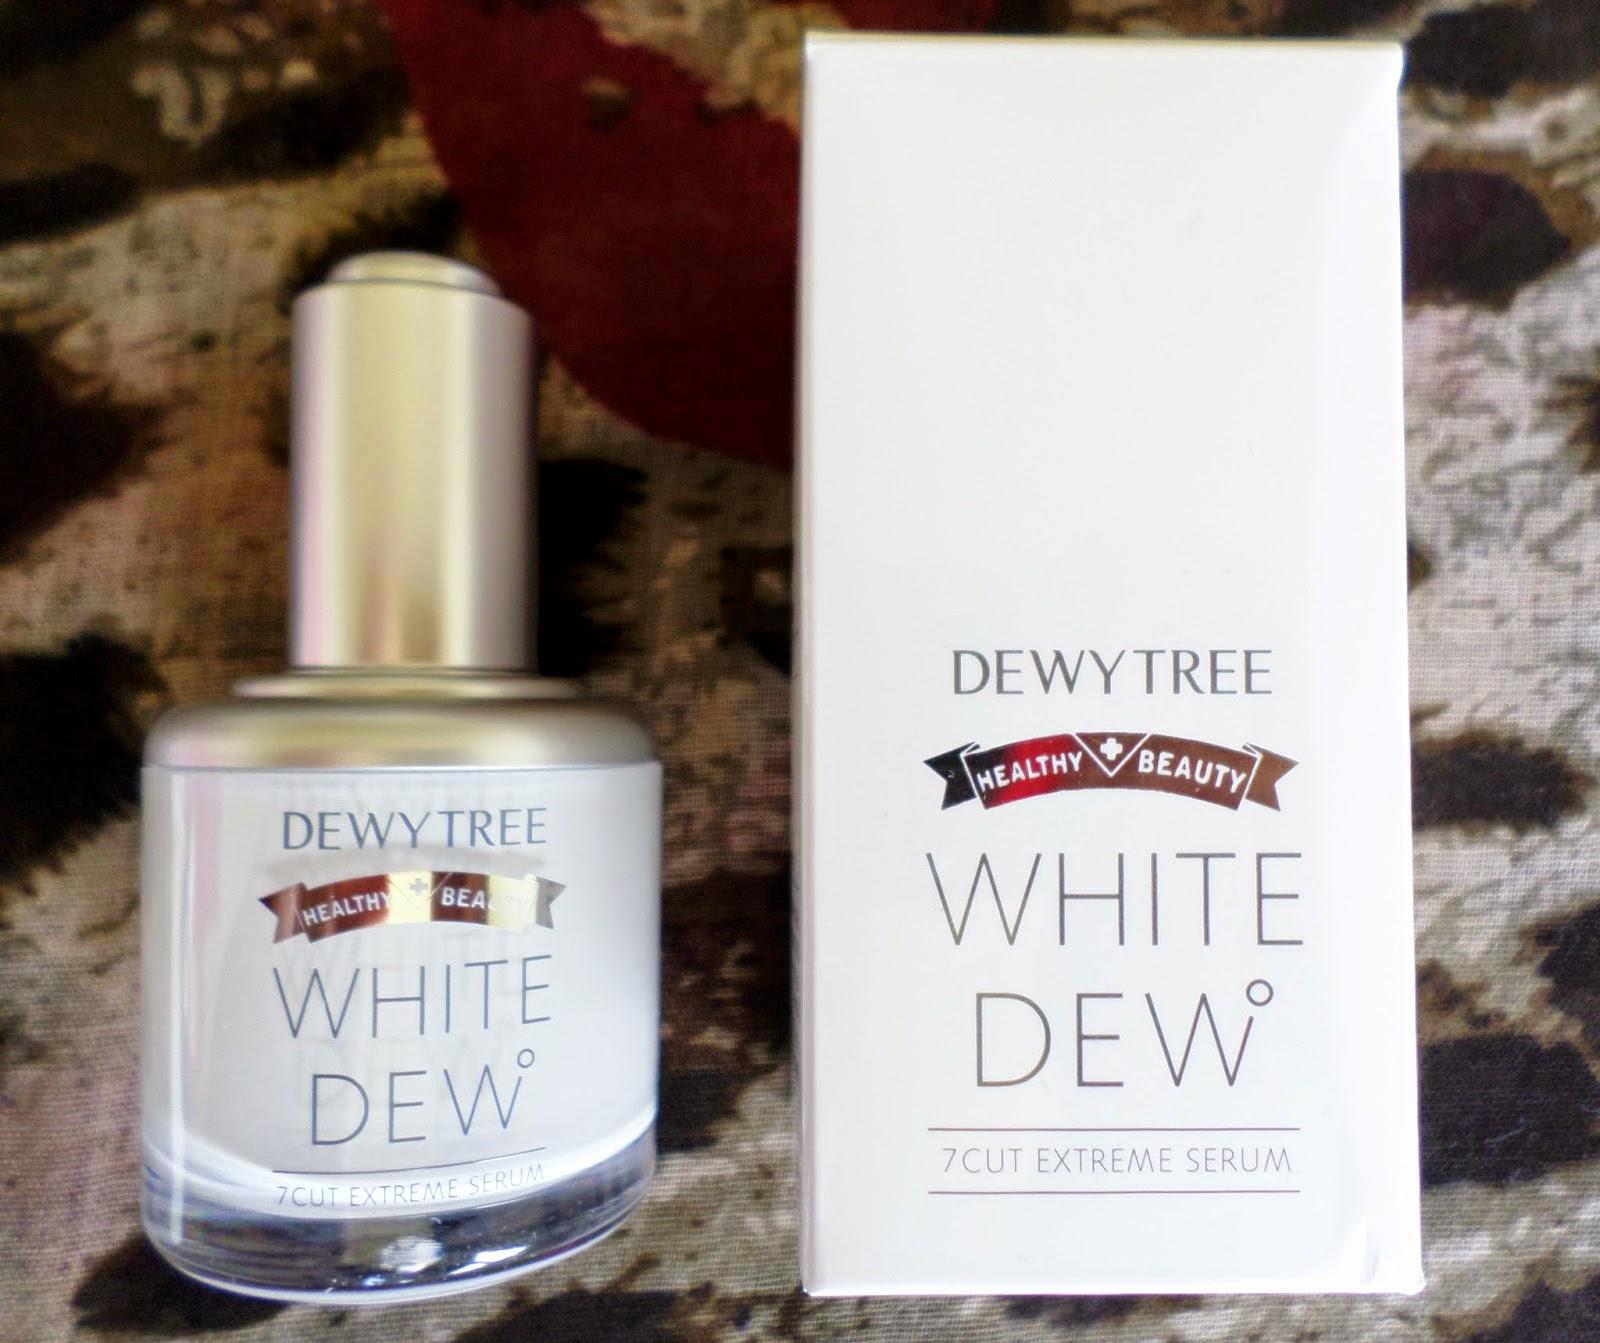 Dewytree White Dew 7 Cut Extreme Serum